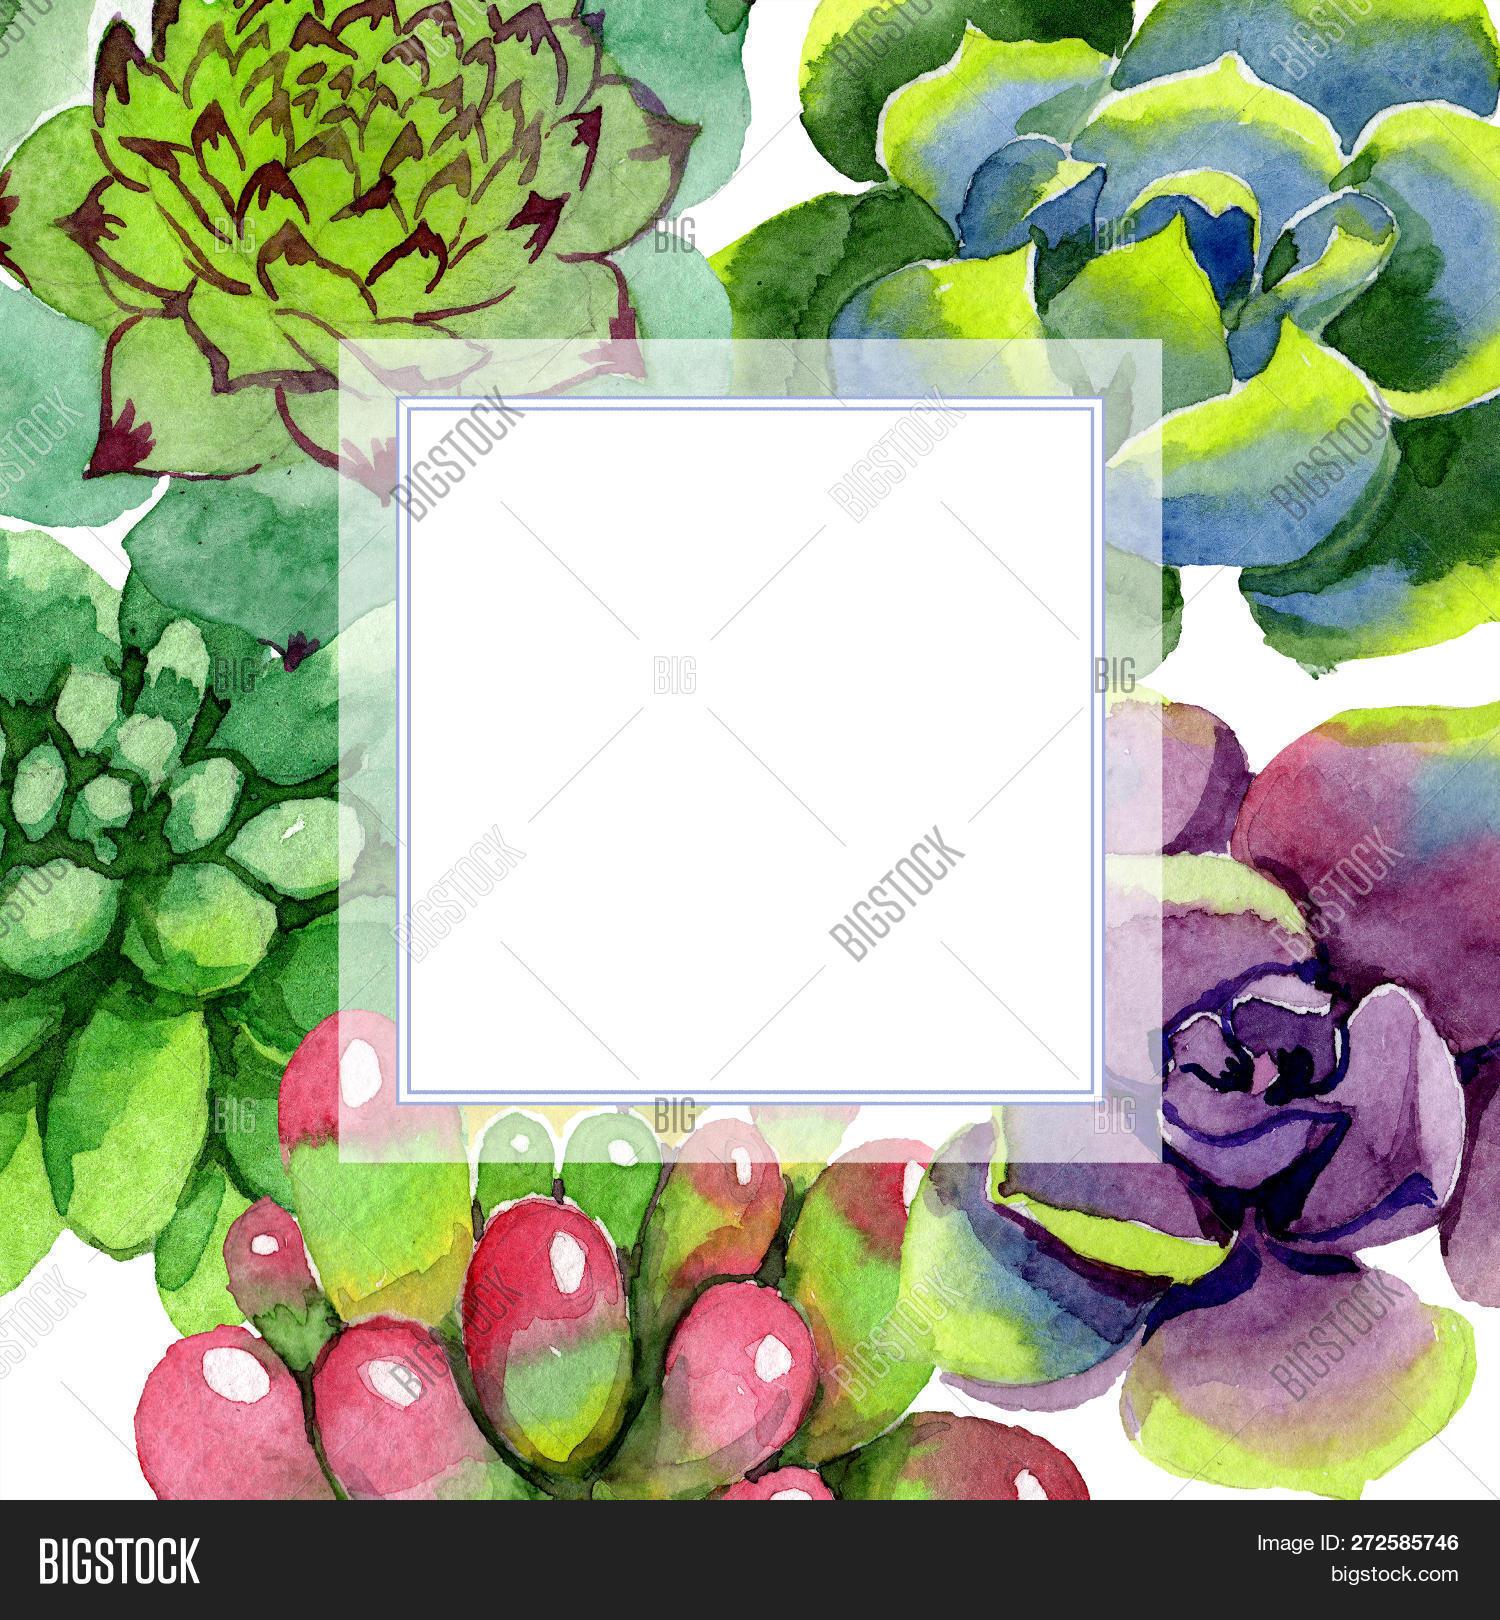 Amazing Succulent Image Photo Free Trial Bigstock